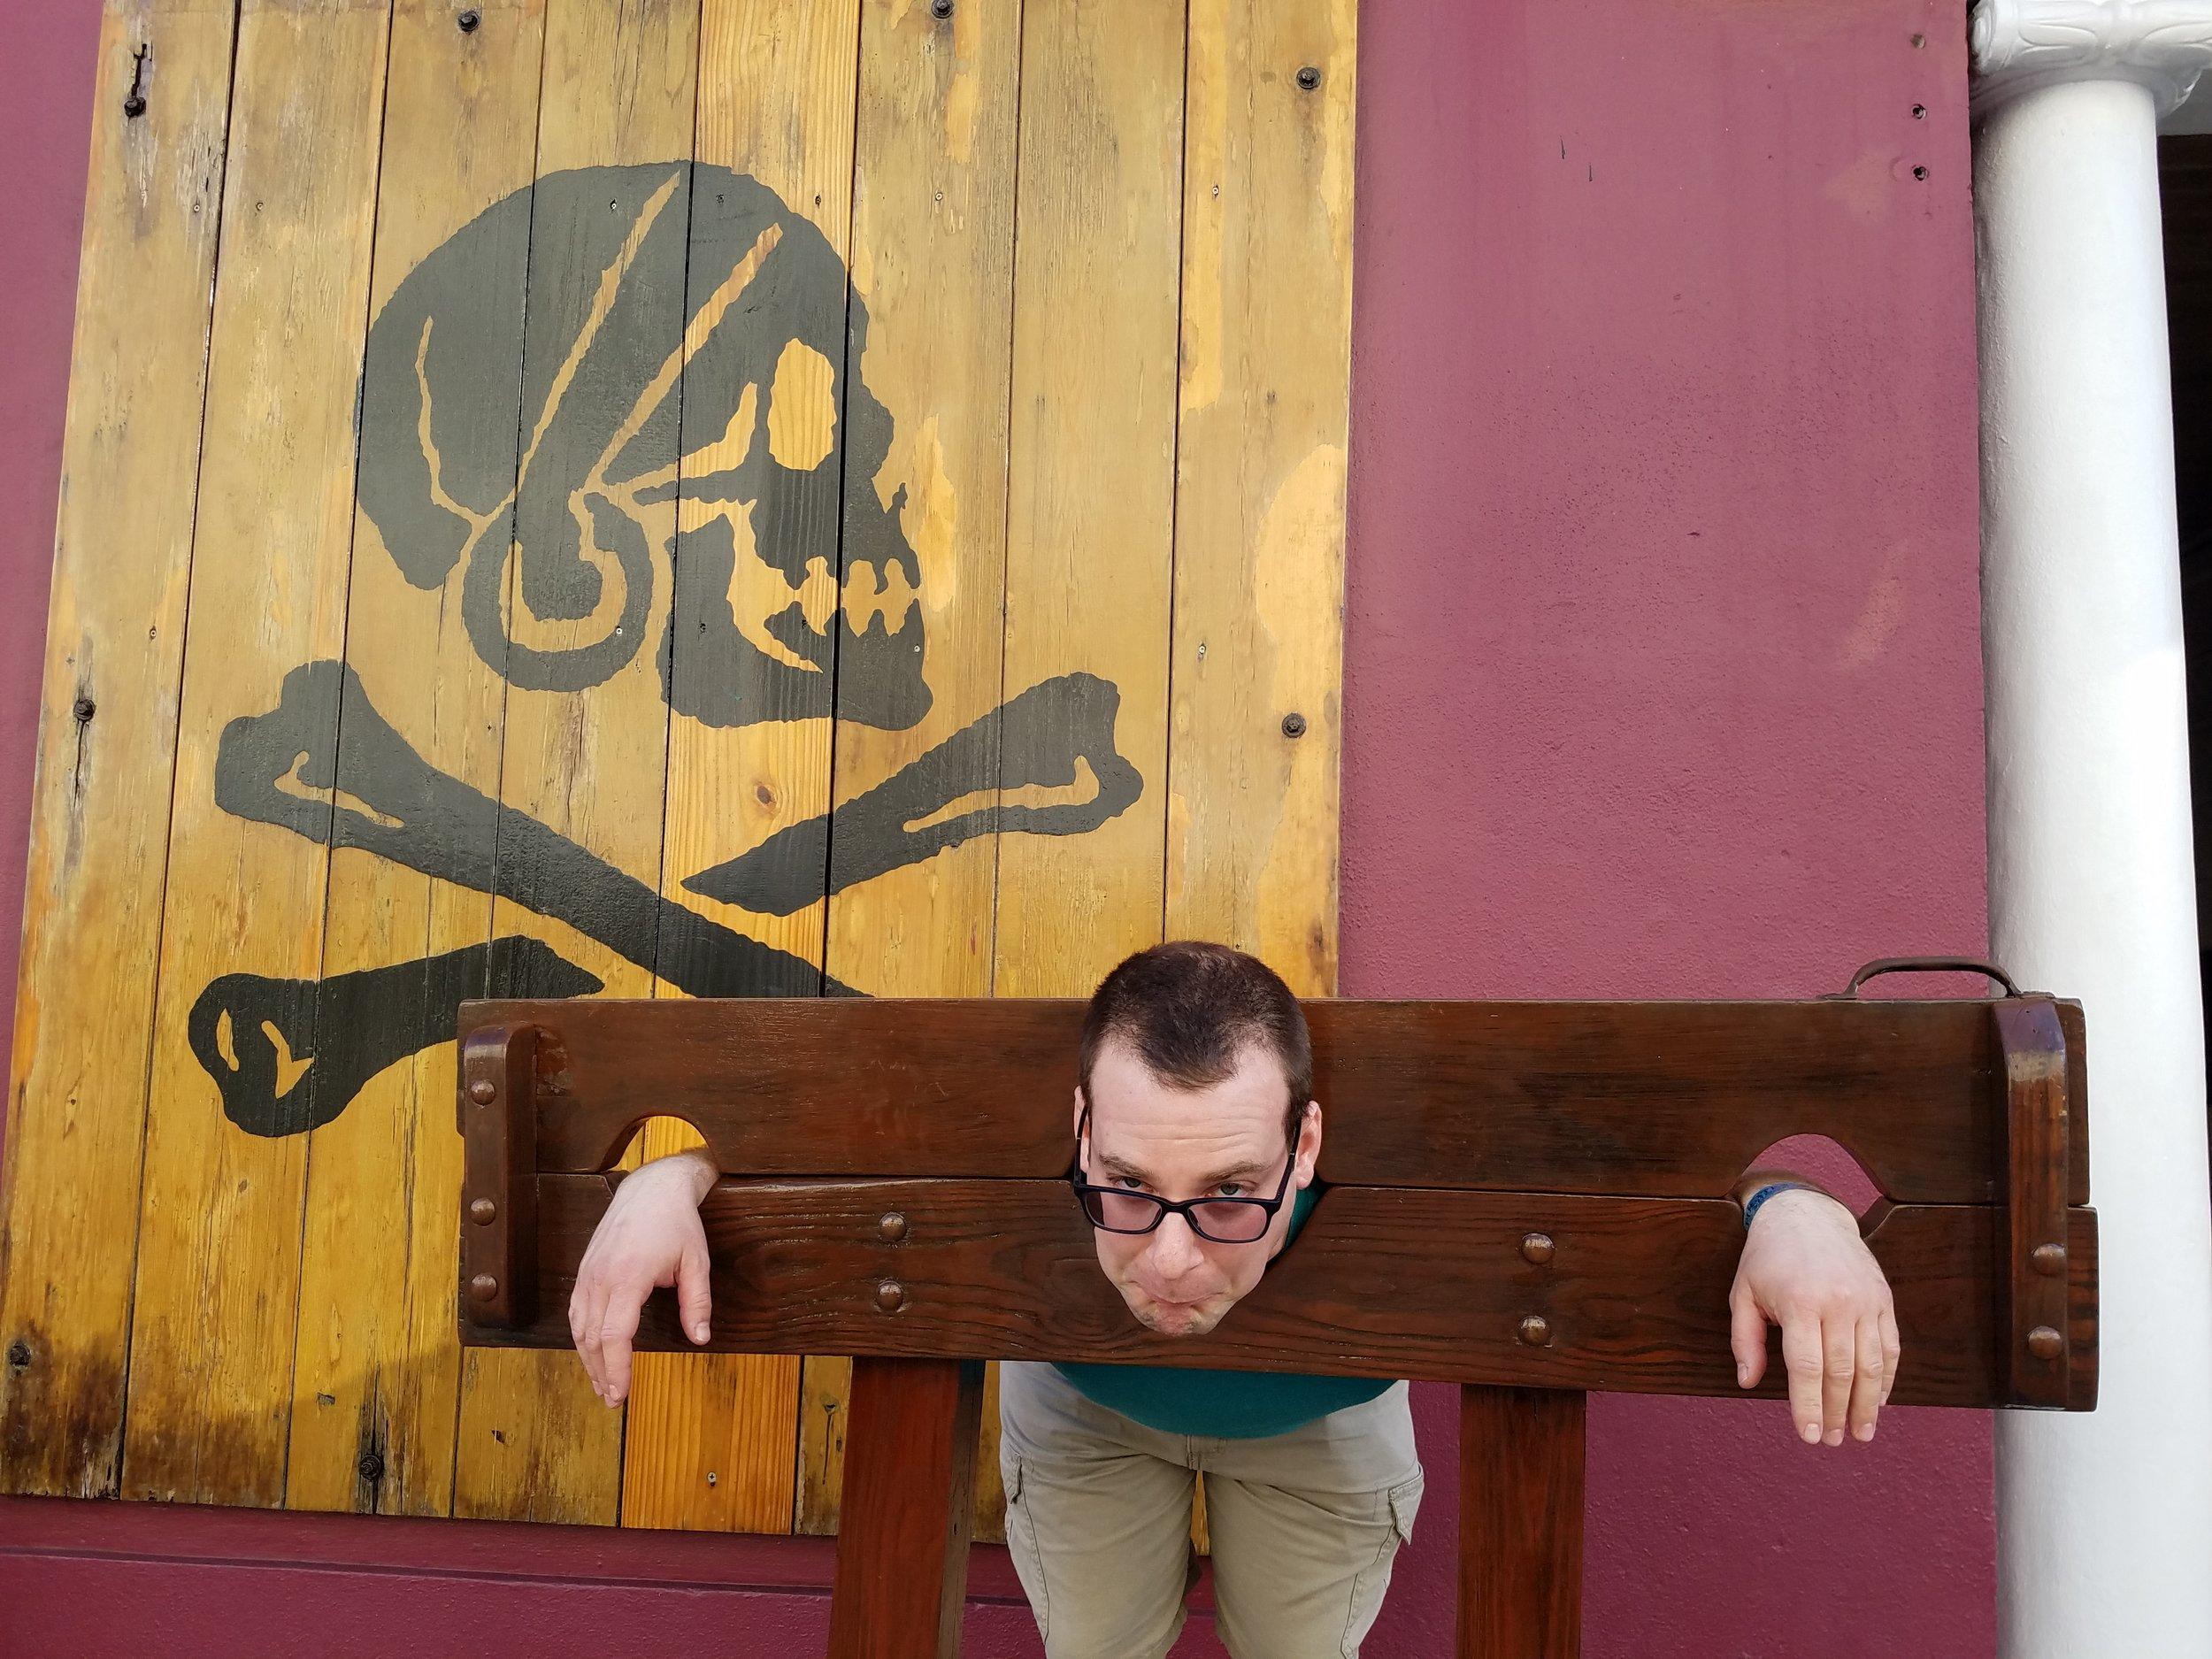 Steve at Pirates museum Bahamas.jpg